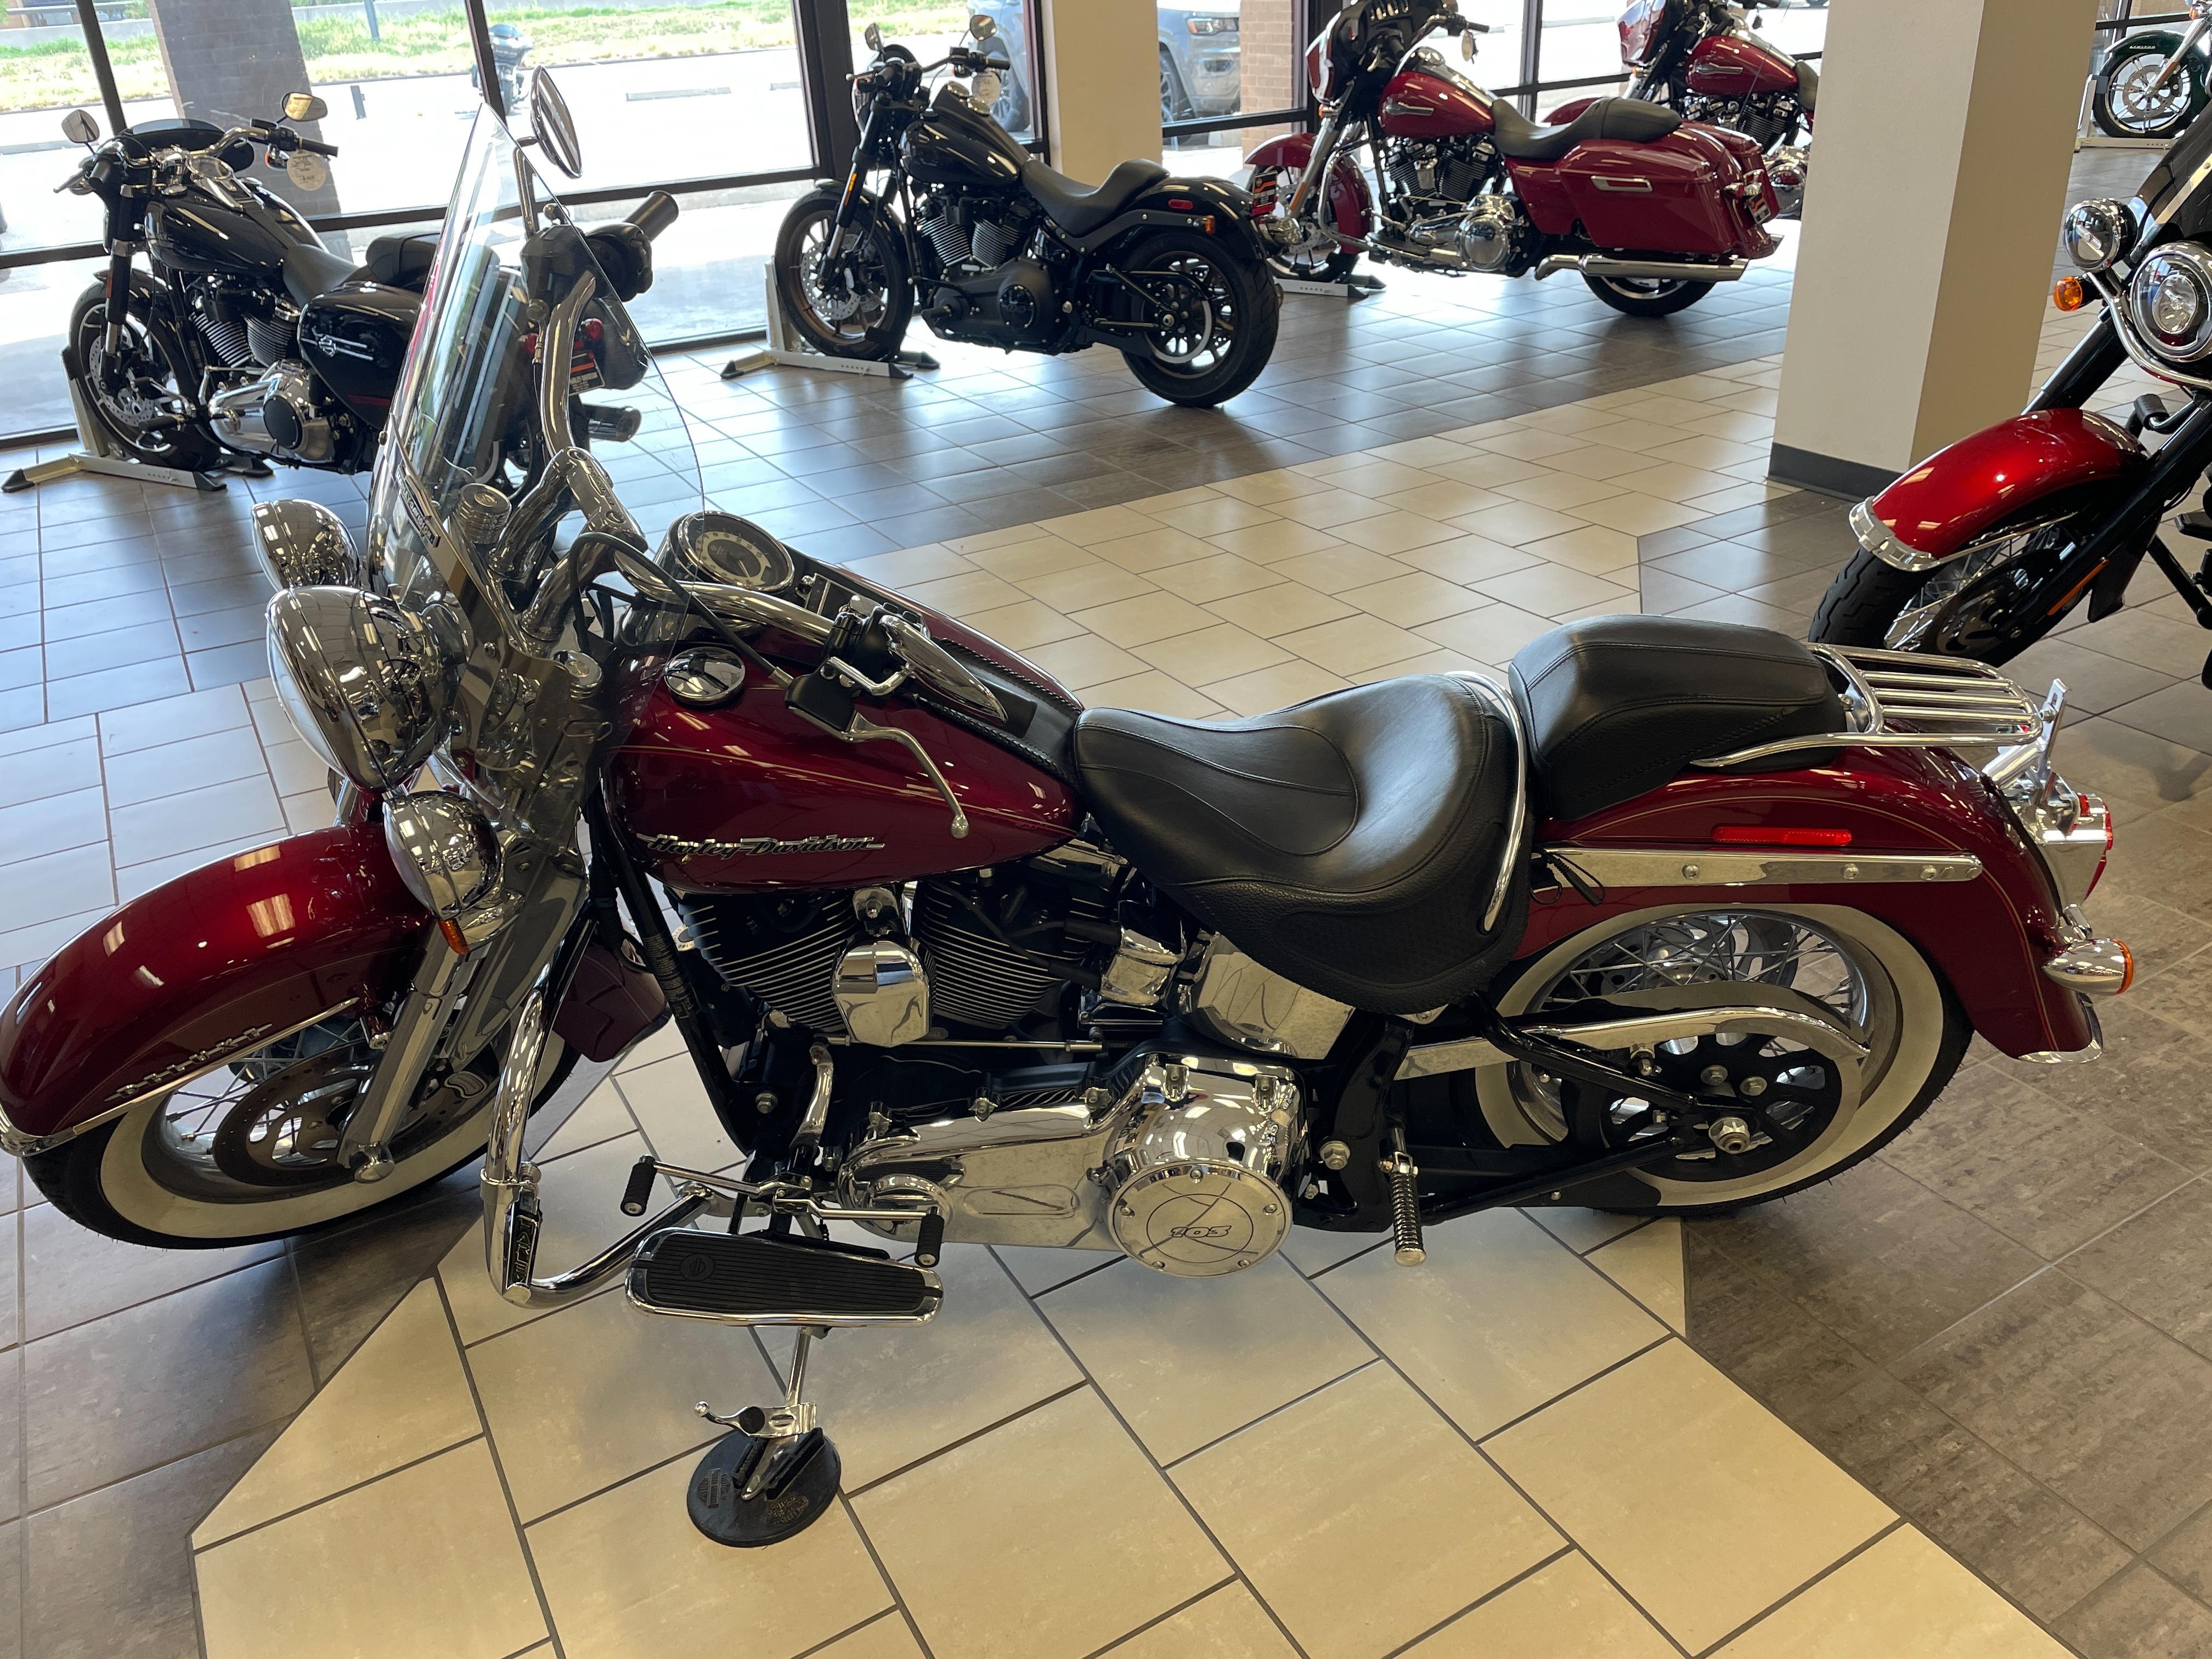 2017 Harley-Davidson Softail Deluxe Deluxe at Tripp's Harley-Davidson